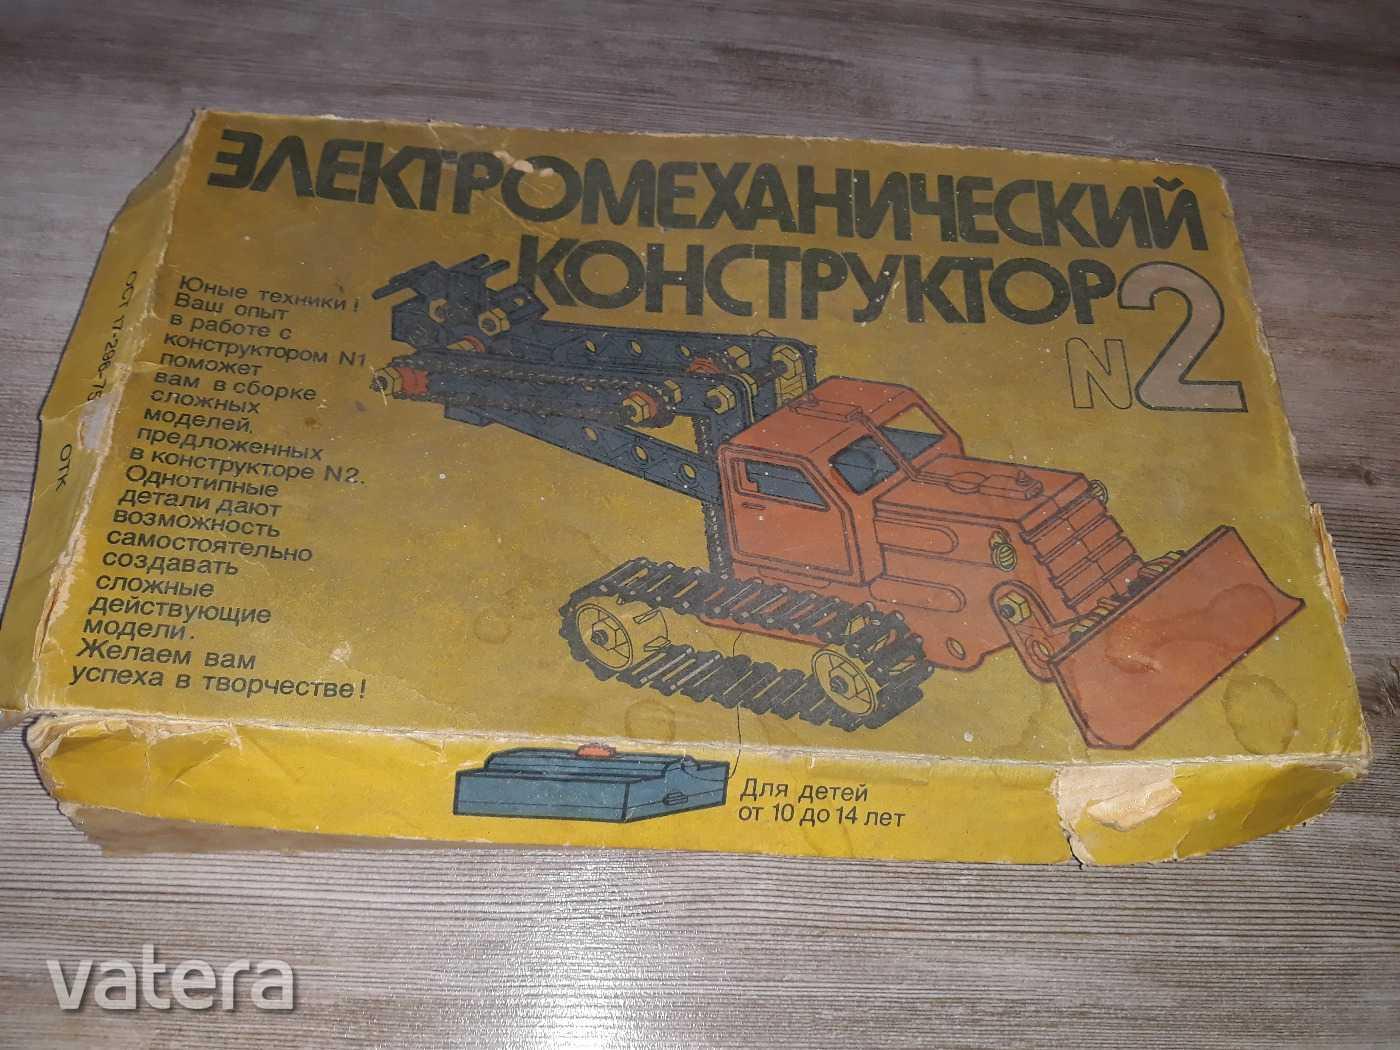 retro-orosz-elektromos-epitojatek-buldozer-lanctalpas-stb-3dda_1_big.jpg